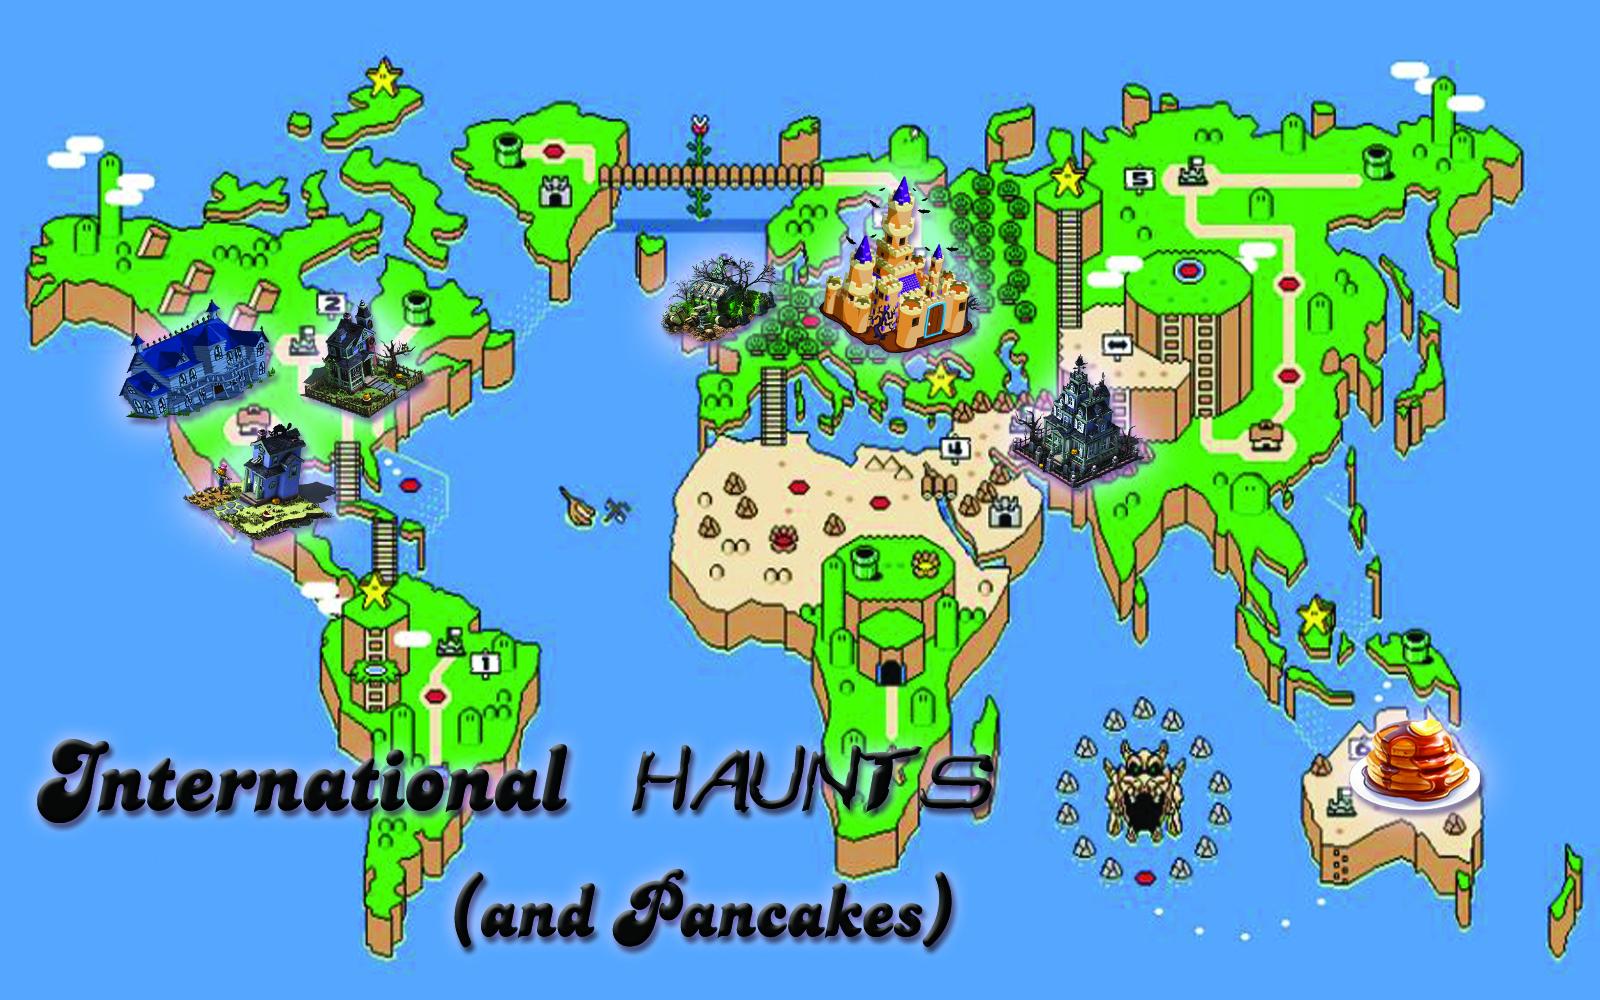 International Haunts